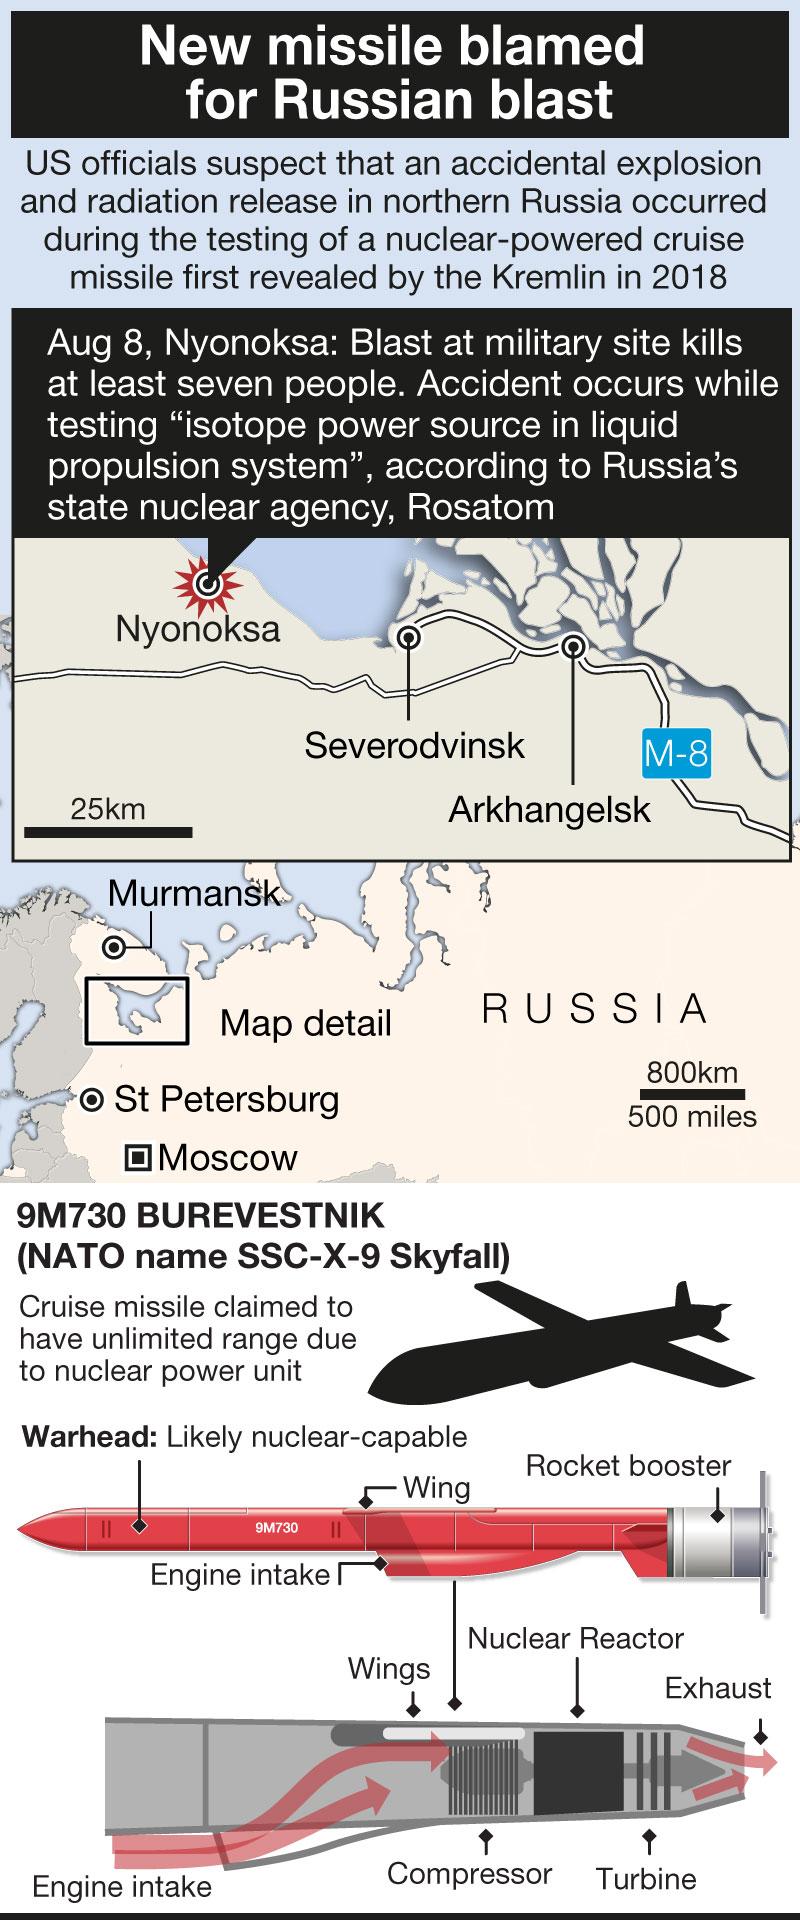 Nyonoksa missile disaster: Doctors who treated victims